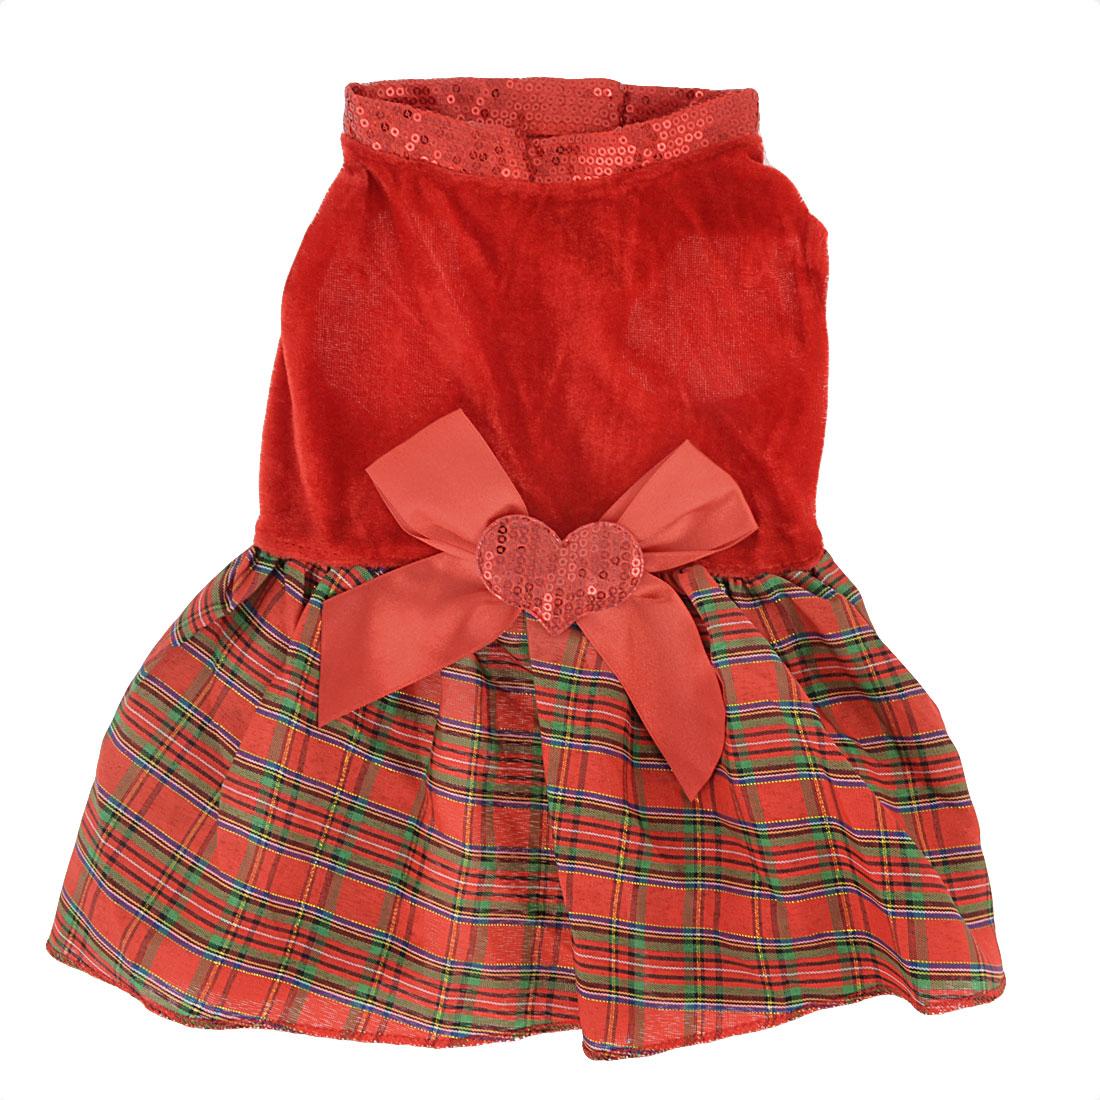 Bowknot Heart Detail Plaid Printed Pet Dog Yorkie Apparel Dress Skirt Red XS